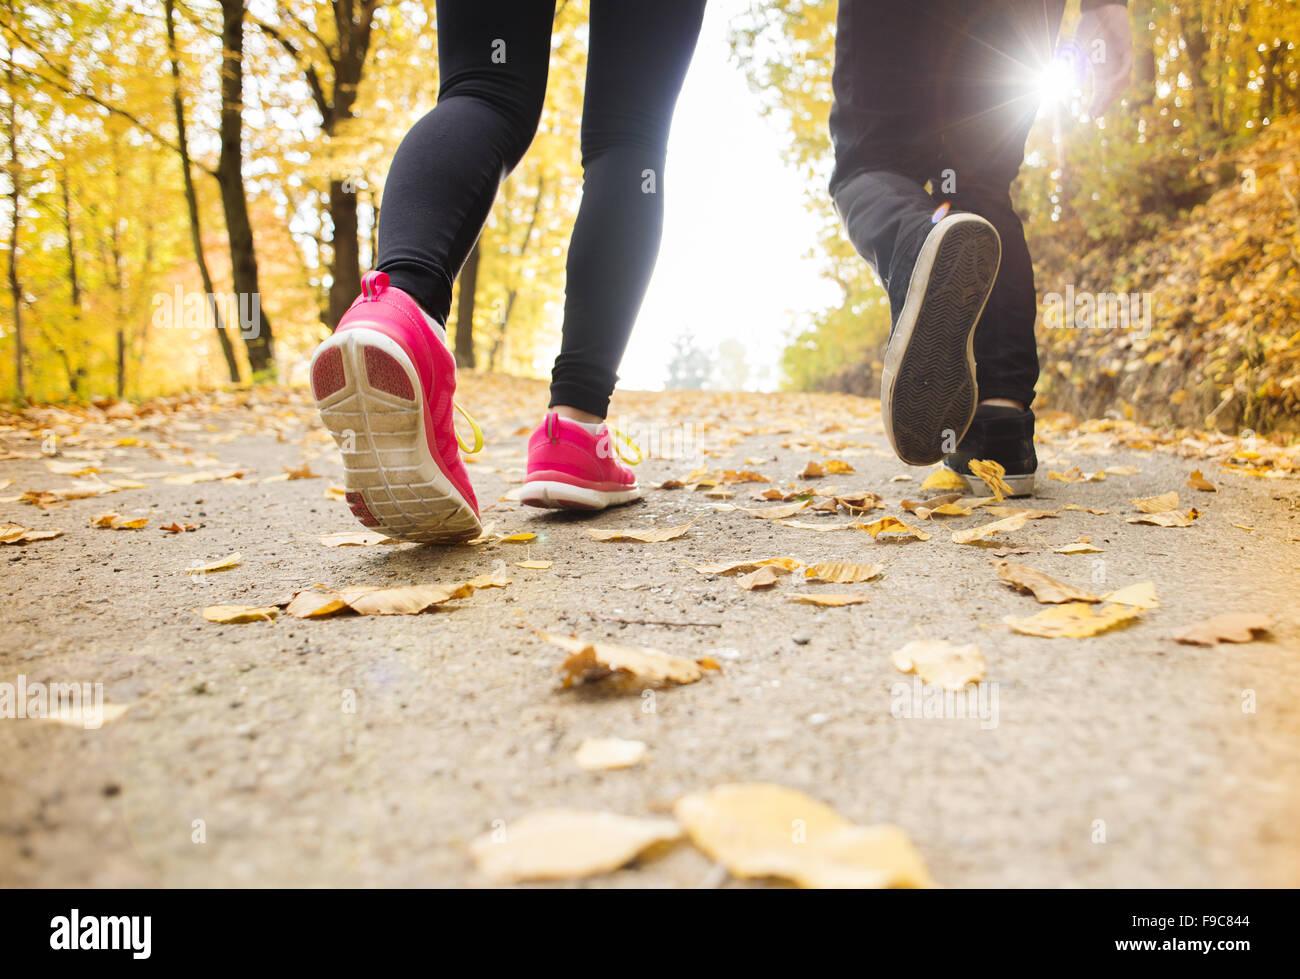 Junge Paar im Herbst Natur joggen laufen Stockbild